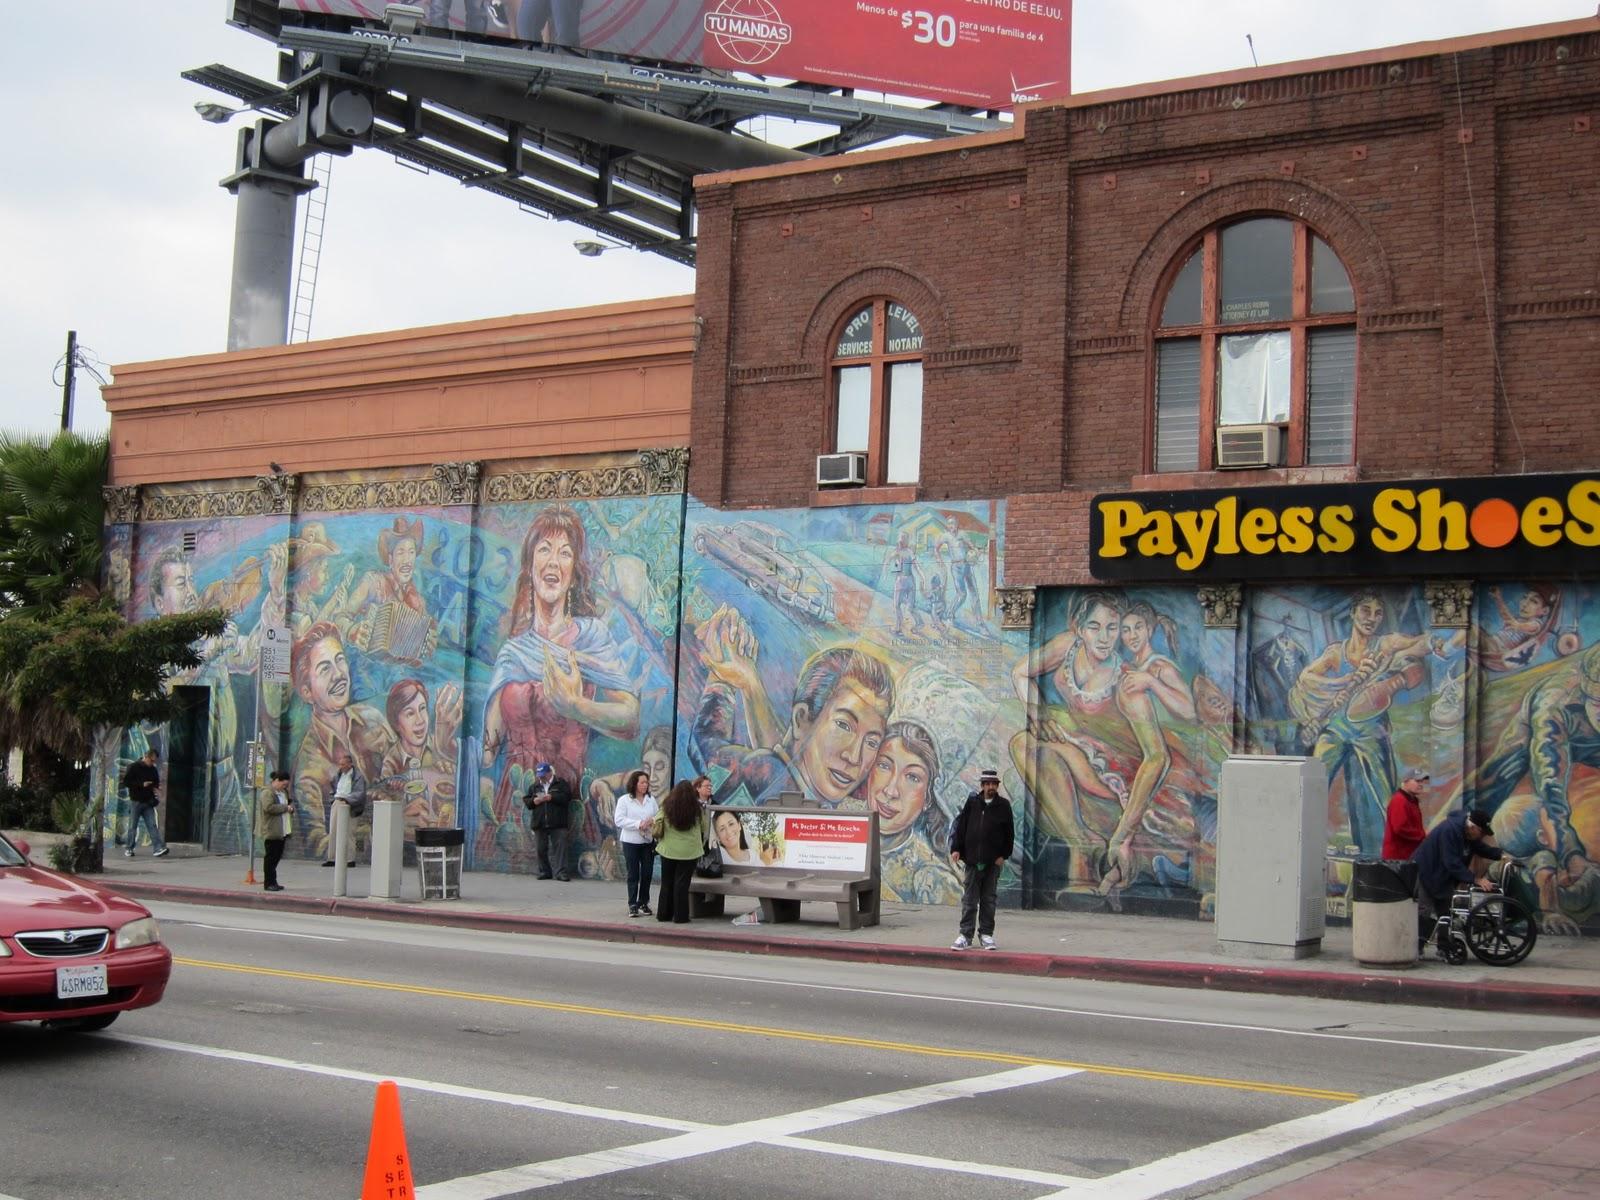 http://1.bp.blogspot.com/_w7chf5eIrcY/TSlRQs-C6WI/AAAAAAAAAMQ/sEU26Rep6h8/s1600/2010+Los+Angeles+Murals+900+Soto+7.JPG